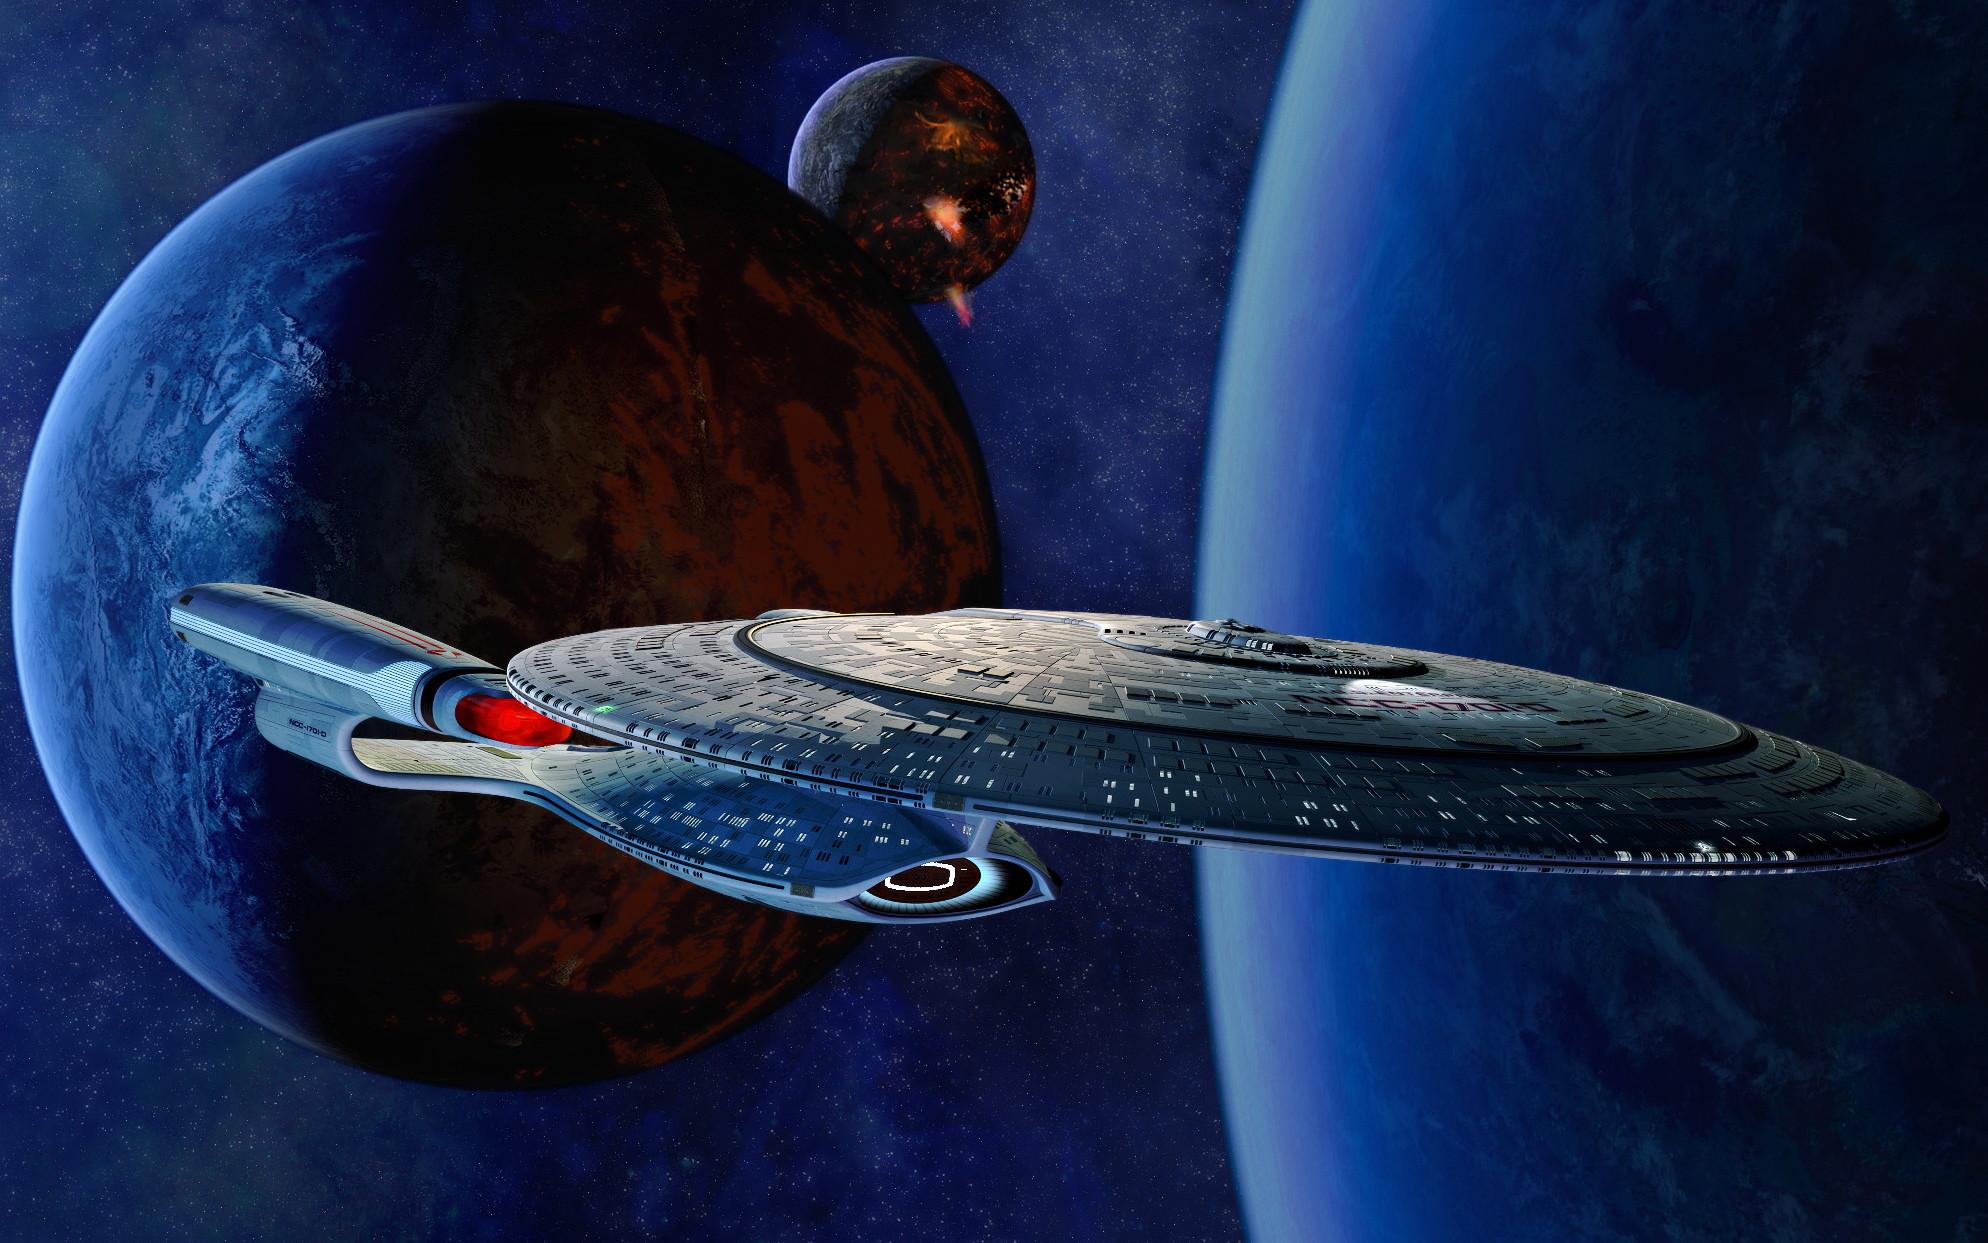 63 Star Trek: The Next Generation HD Wallpapers | Backgrounds – Wallpaper  Abyss